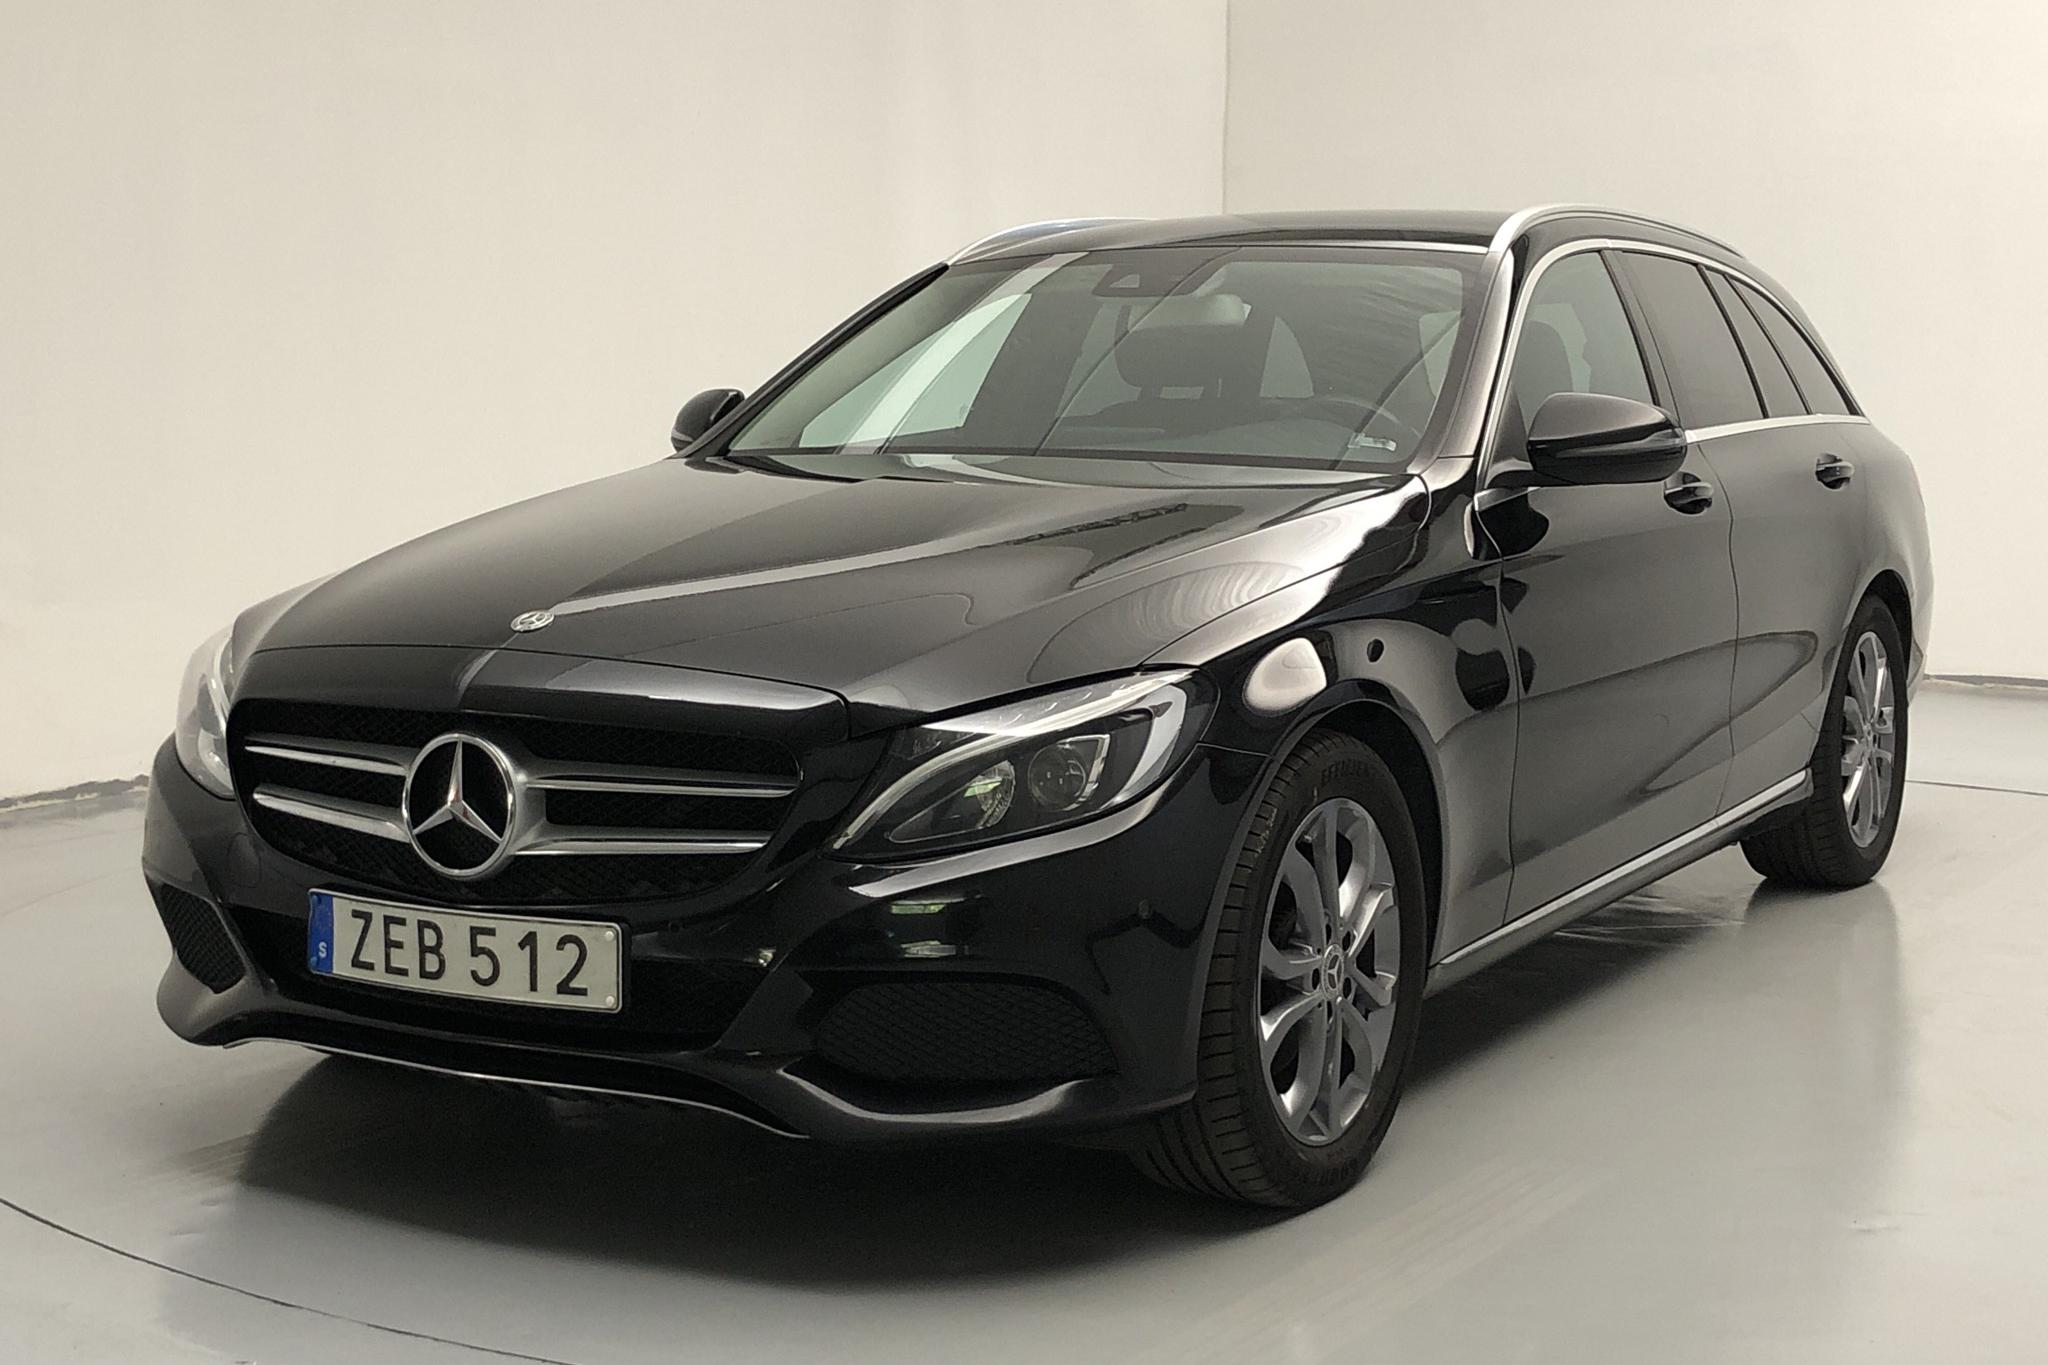 Mercedes C 220 d Kombi S205 (170hk) - 12 356 mil - Automat - svart - 2018